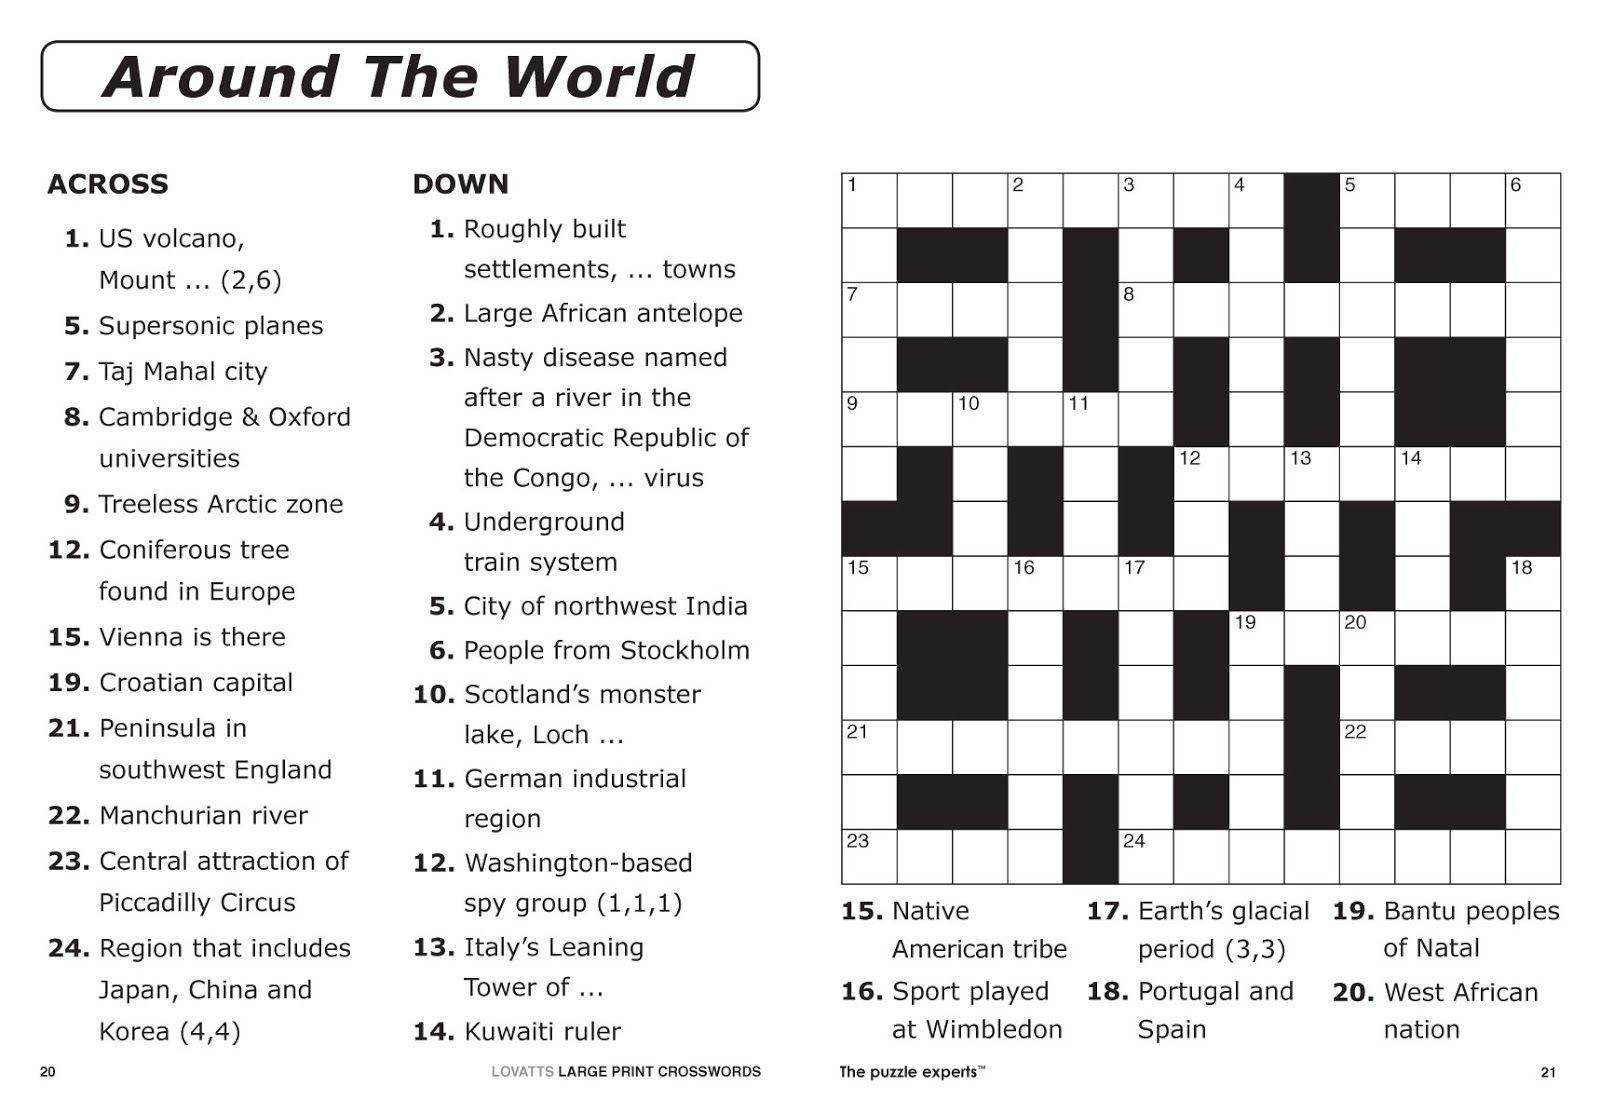 Free Printable Large Print Crossword Puzzles | M3U8 - Printable Japanese Puzzles